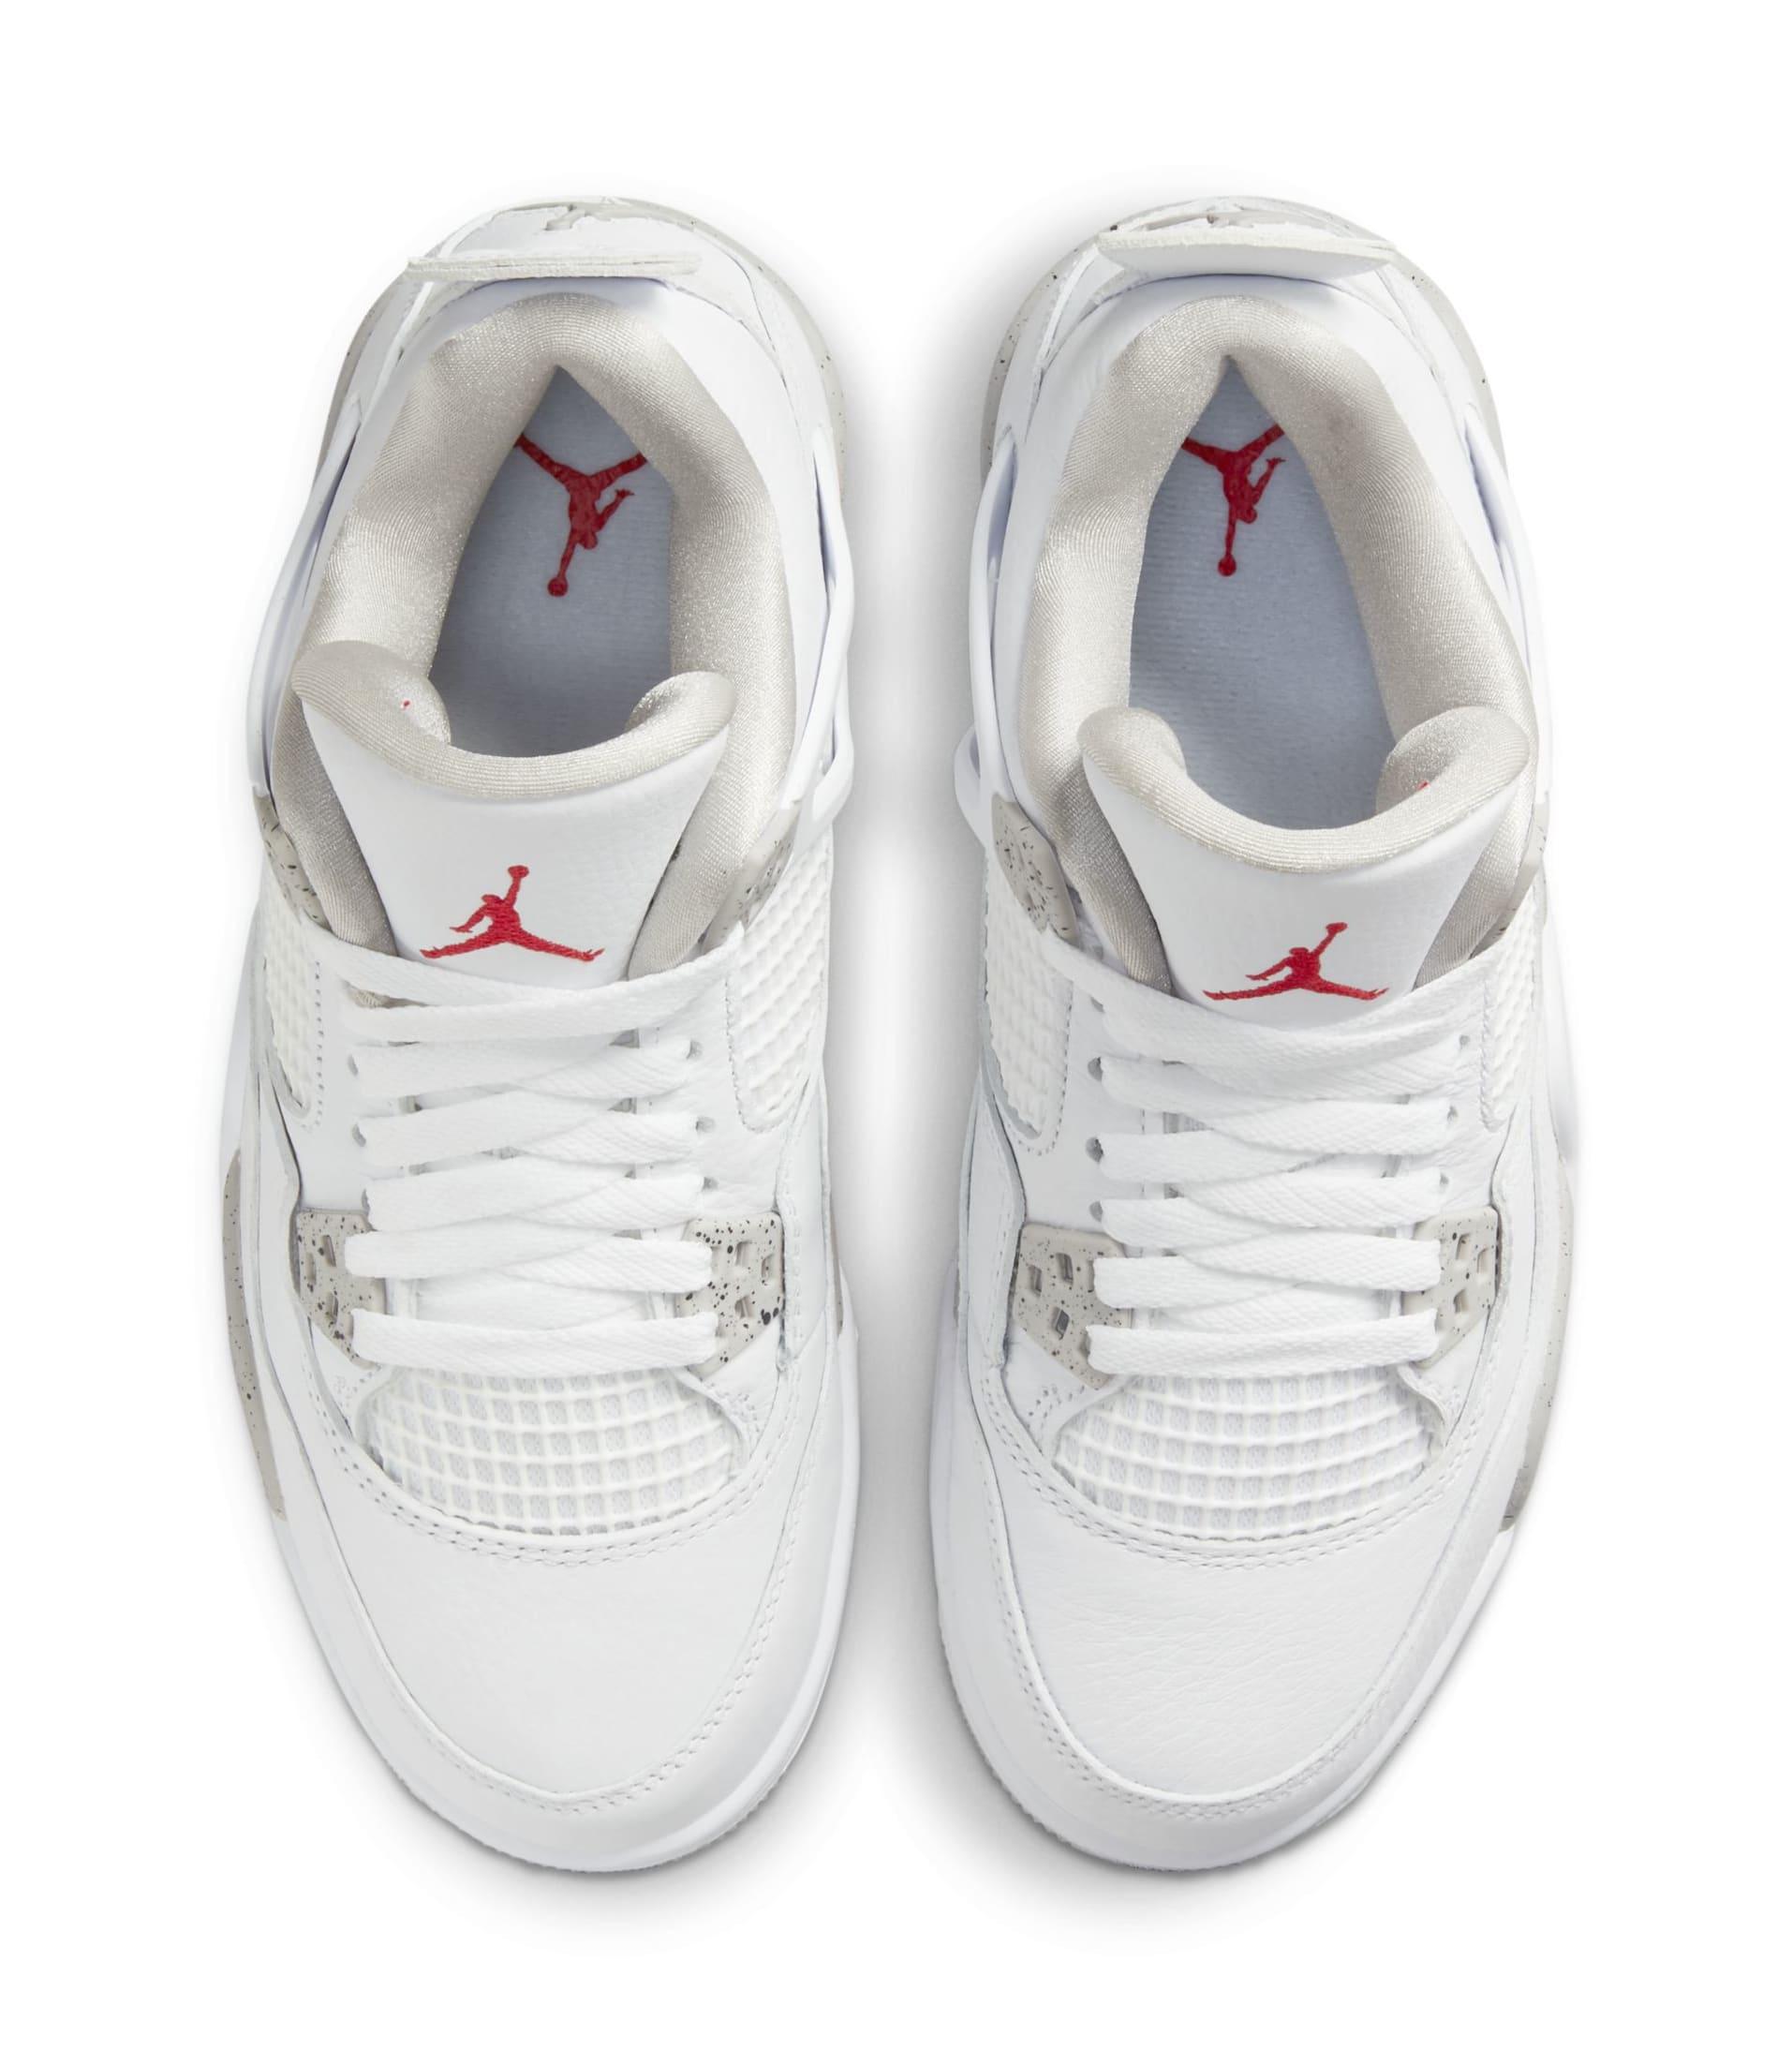 Air Jordan 4 White/Tech Grey/Black/Fire Red CT8527-100 Top